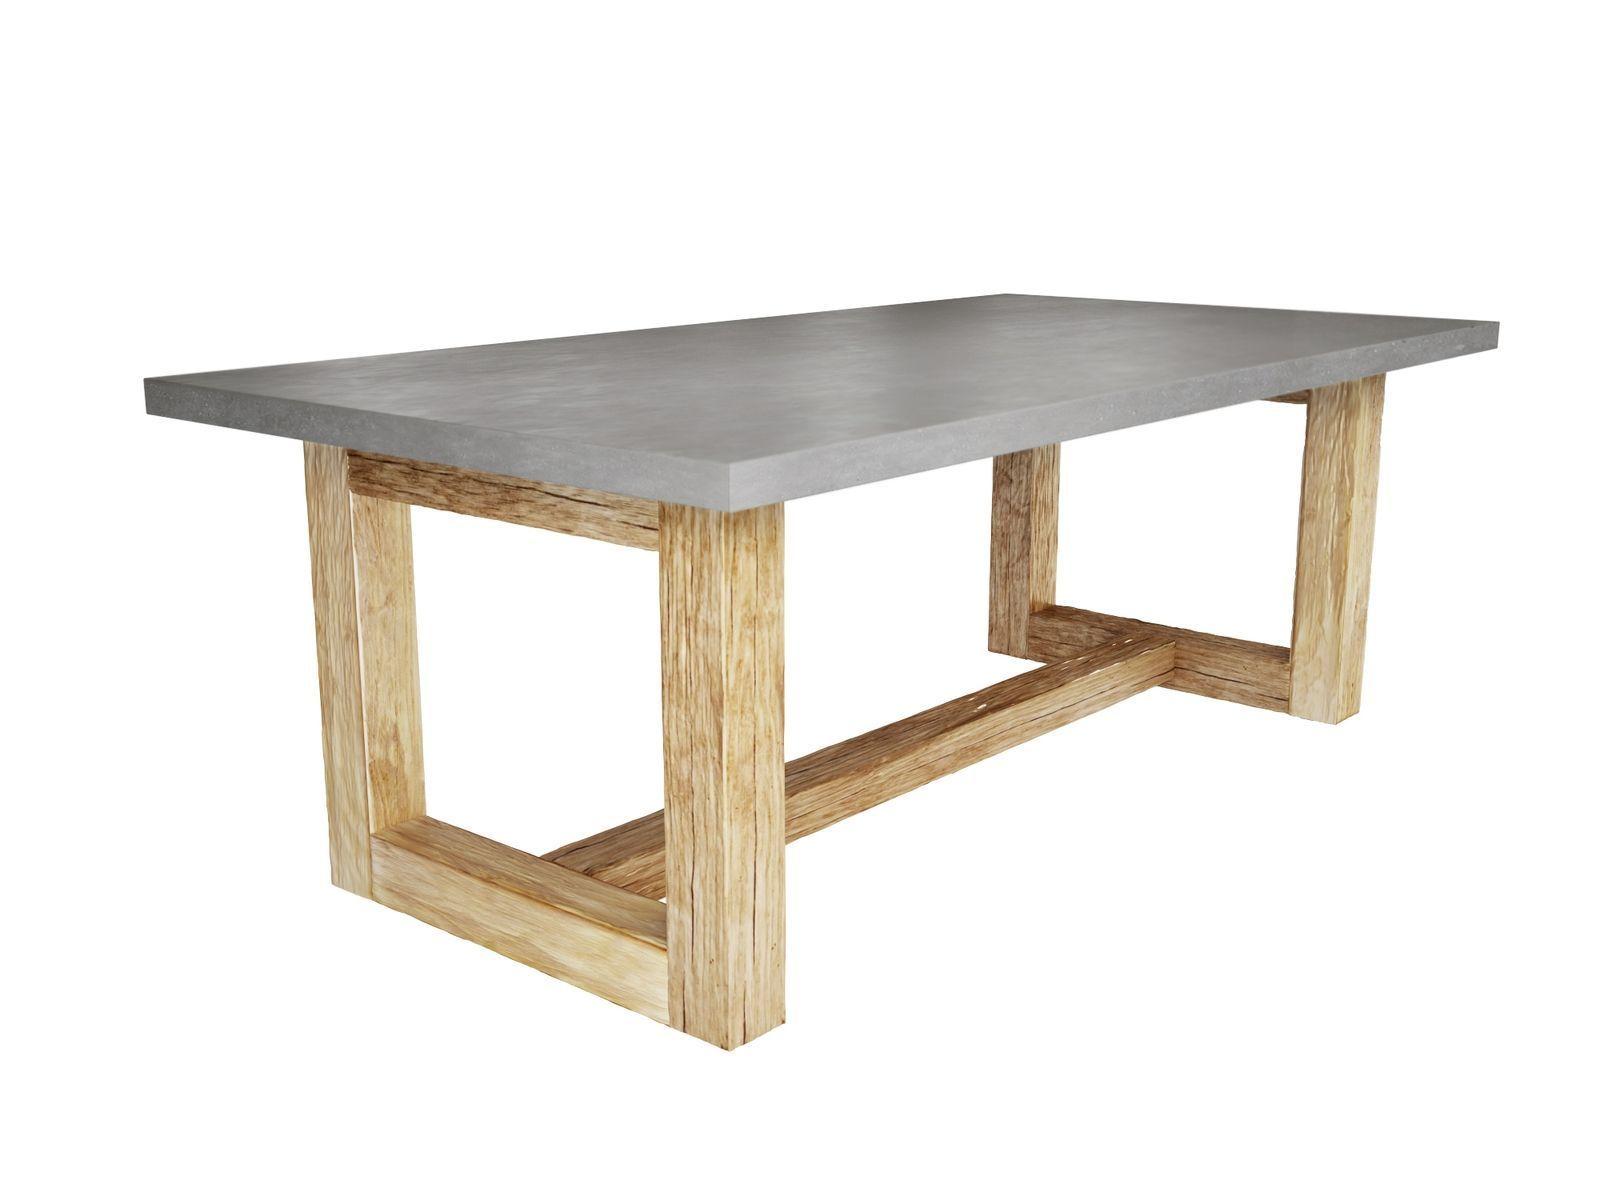 10 Trestle Table Plans Free Concrete Dining Table Concrete Coffee Table Outdoor Farmhouse Table